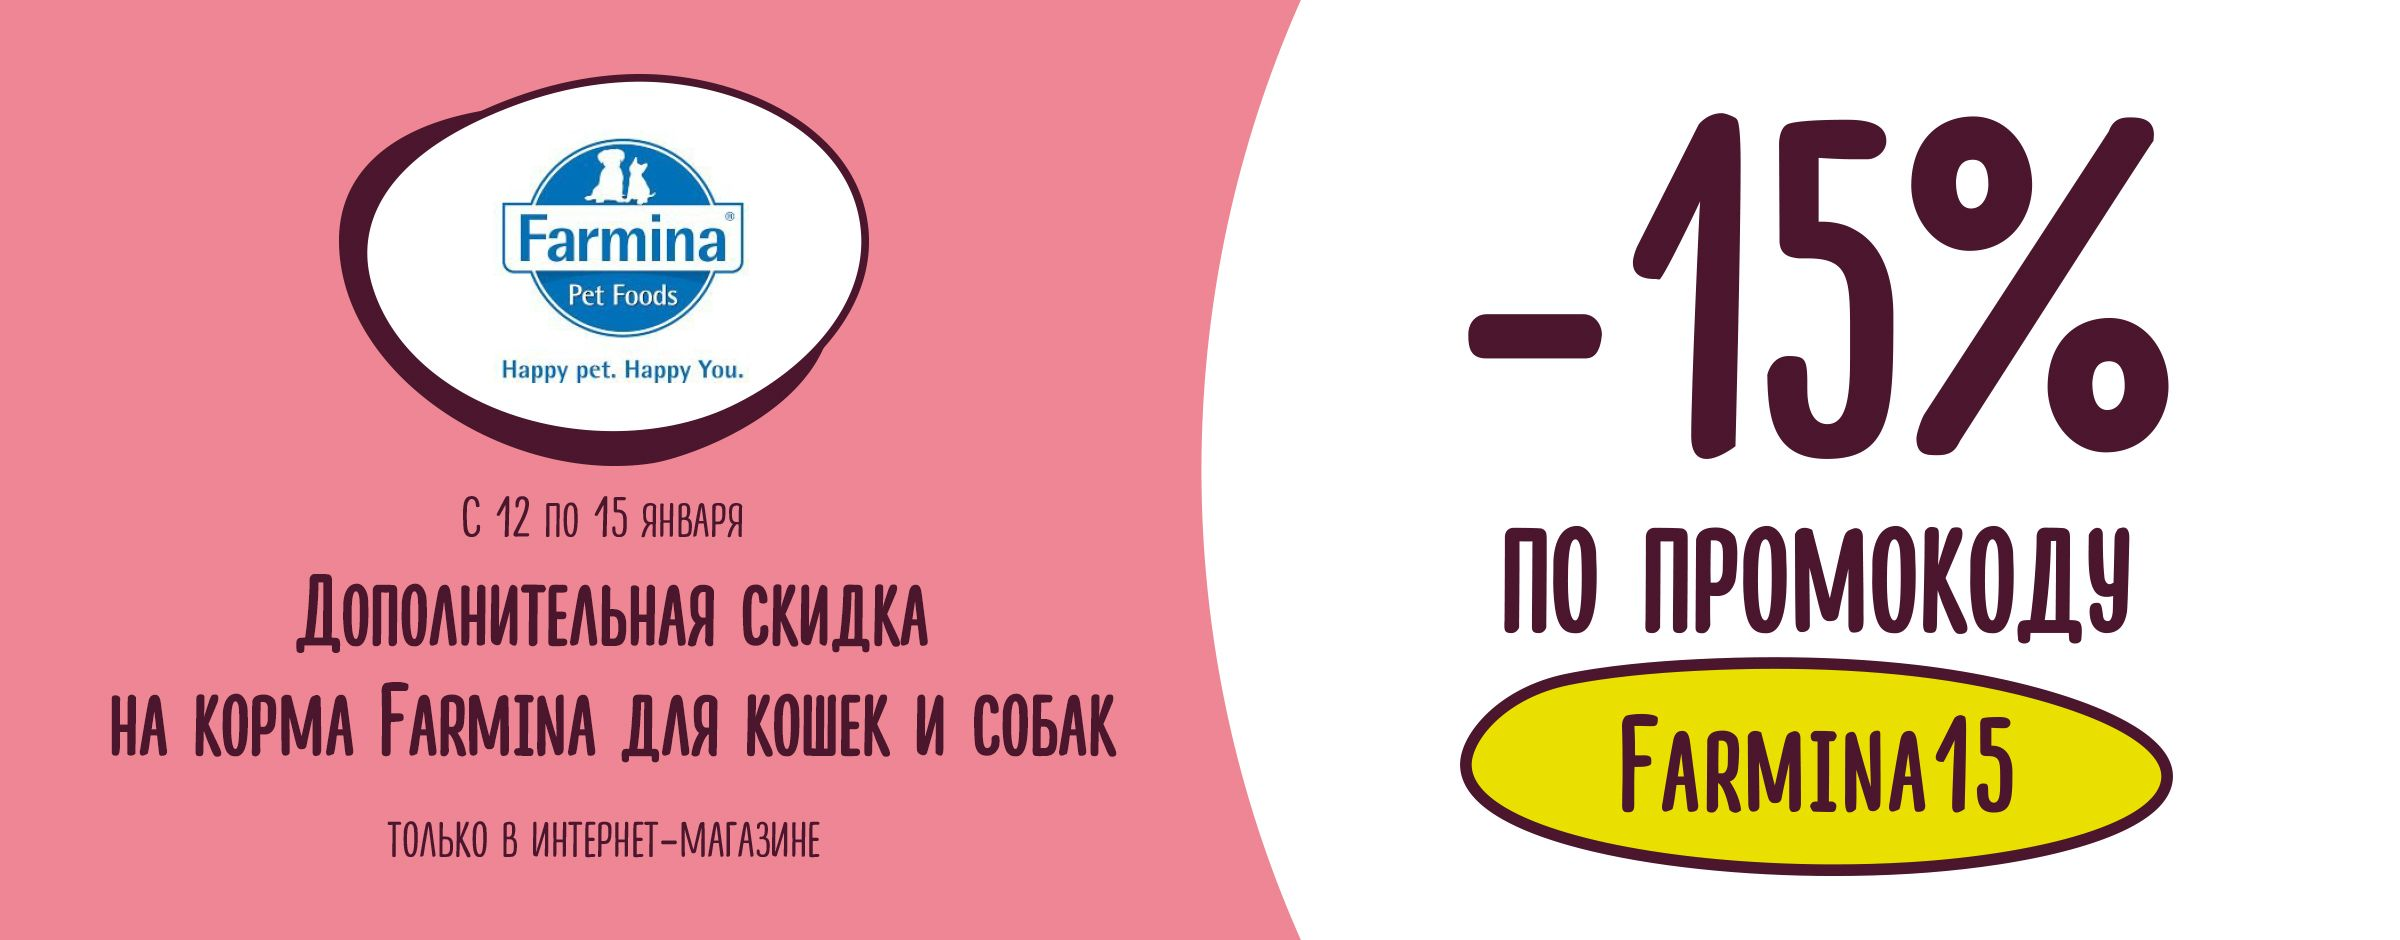 Доп. скидка 15% на корма Farmina для кошек и собак по промокоду